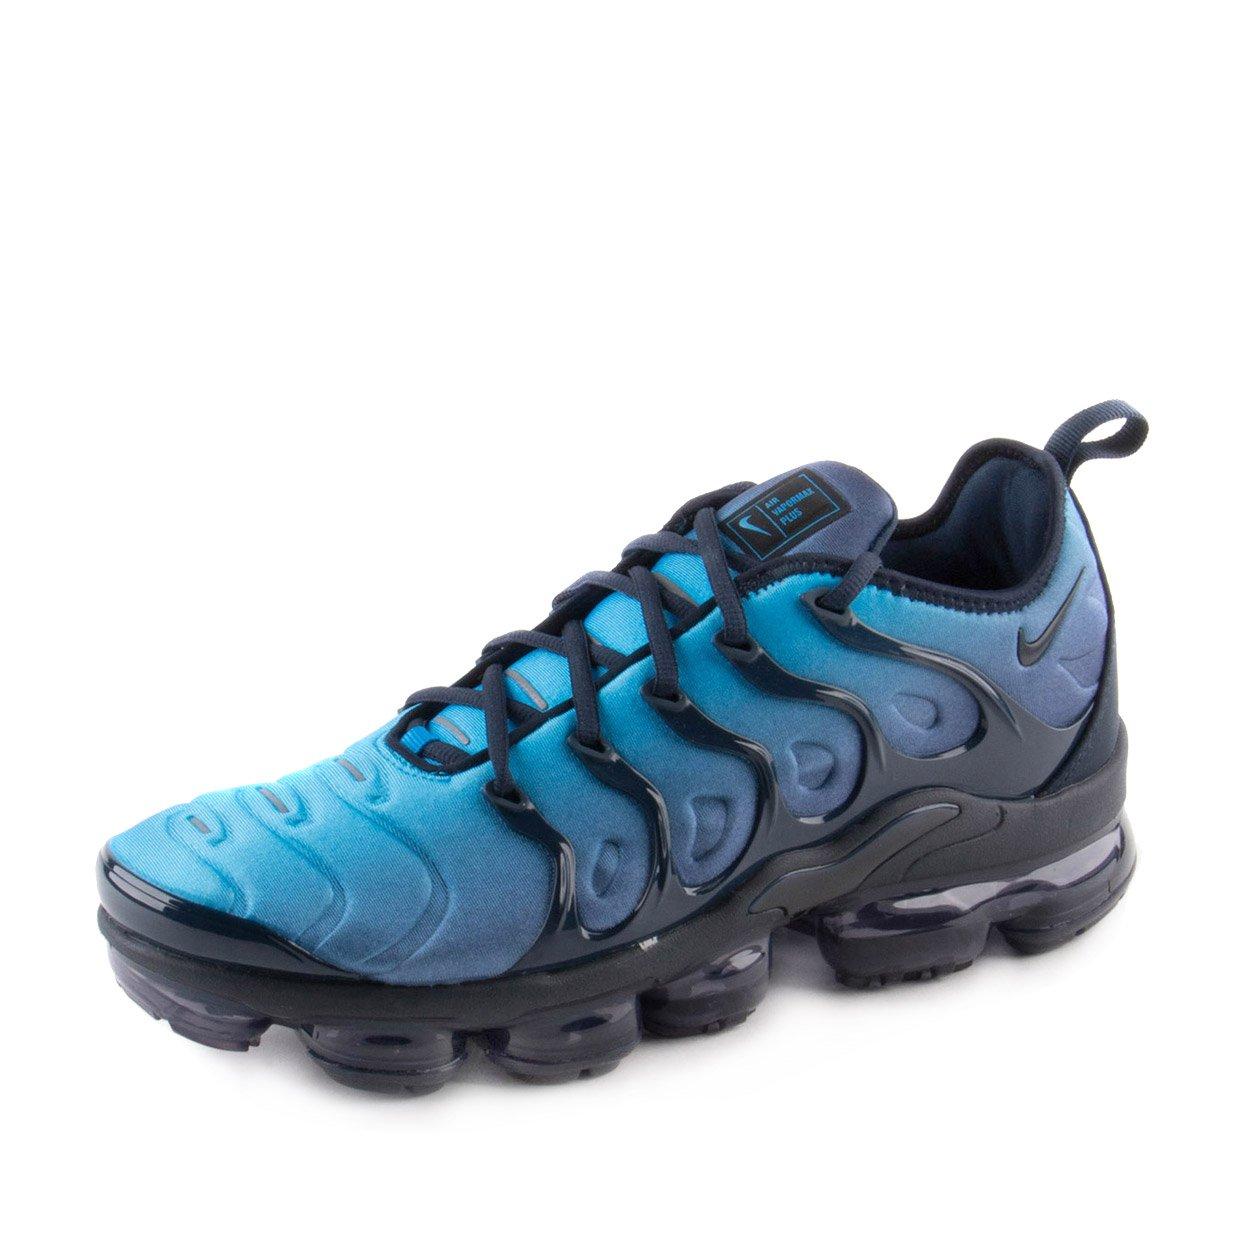 new concept c7606 13773 Nike Mens Air Vapormax Plus Obsidian/Photo Blue Neoprene ...